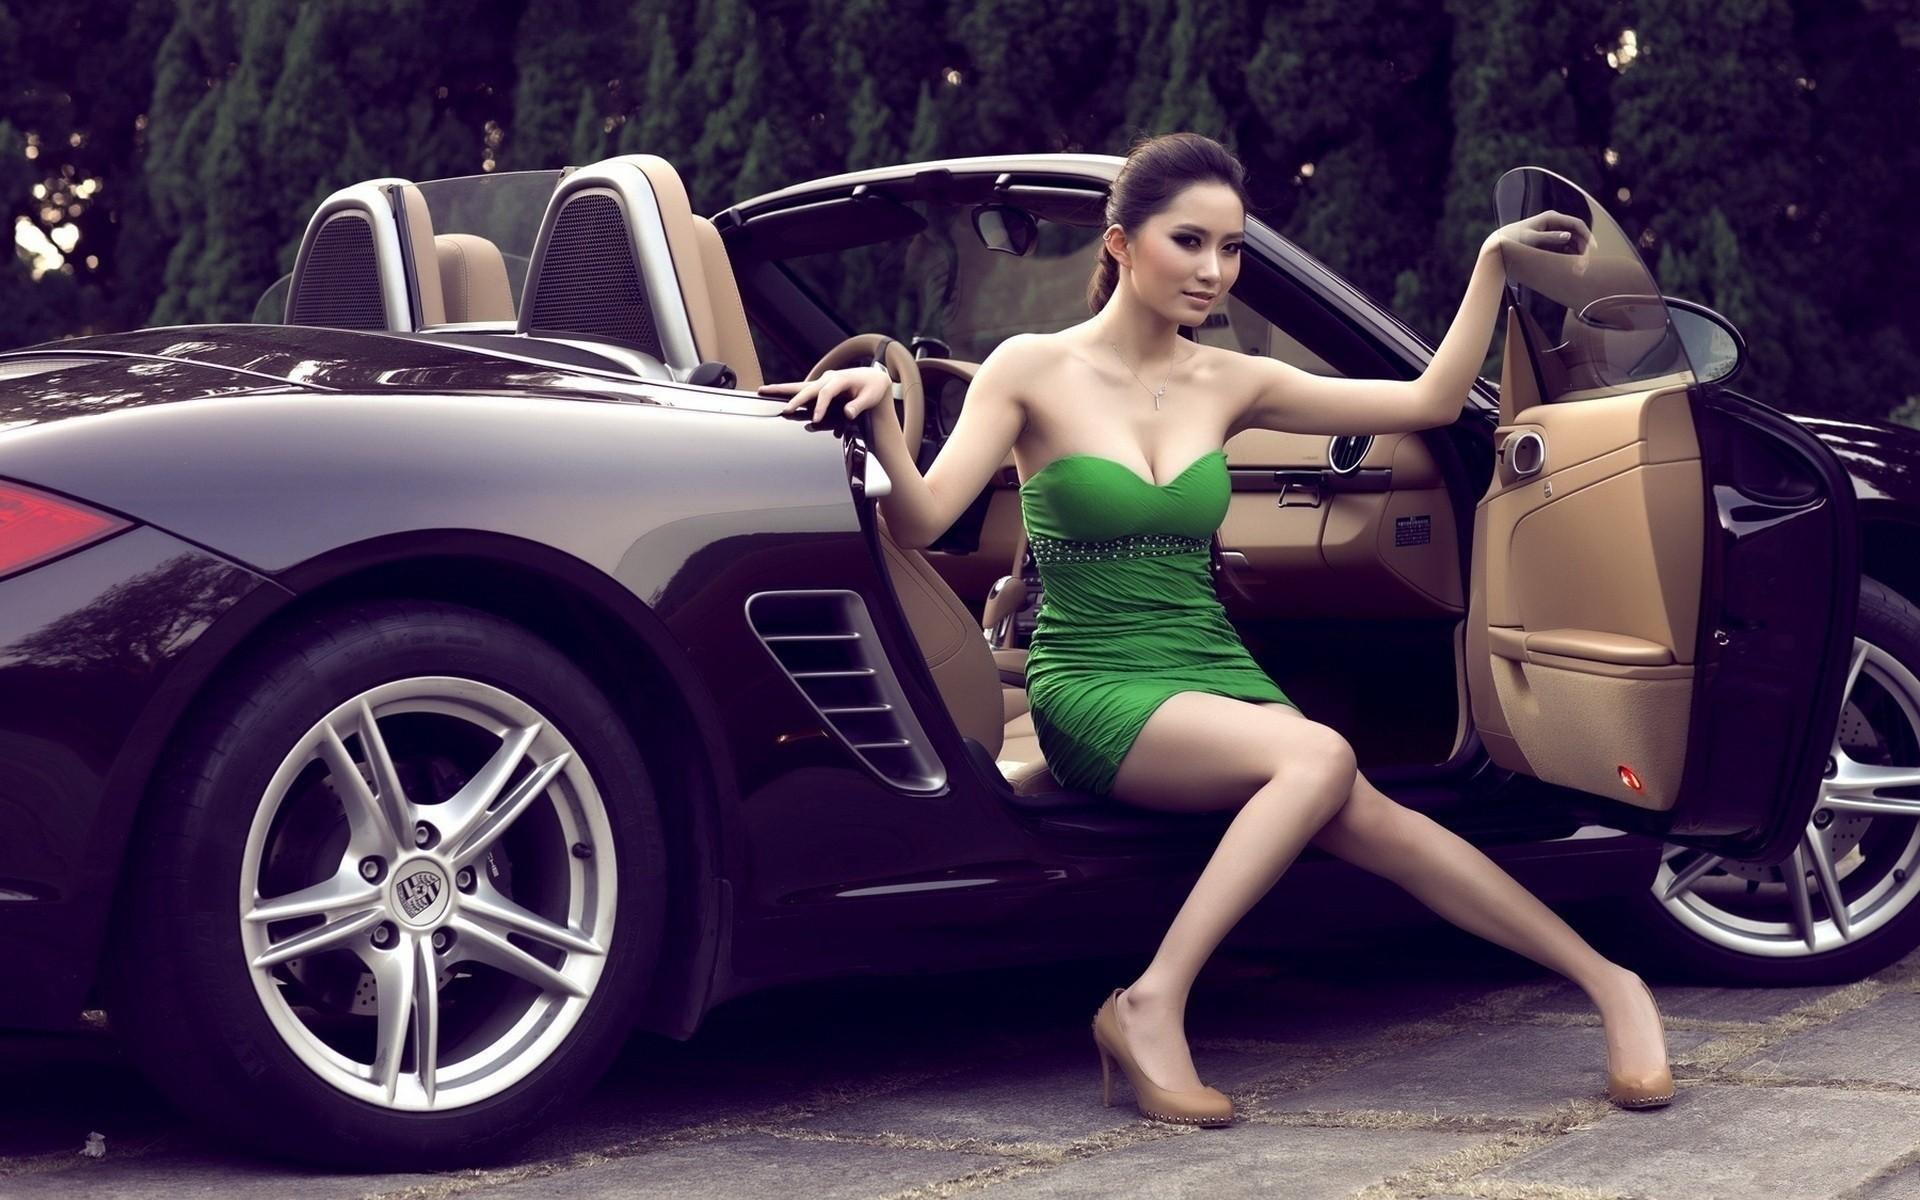 Car girl wallpaper hd